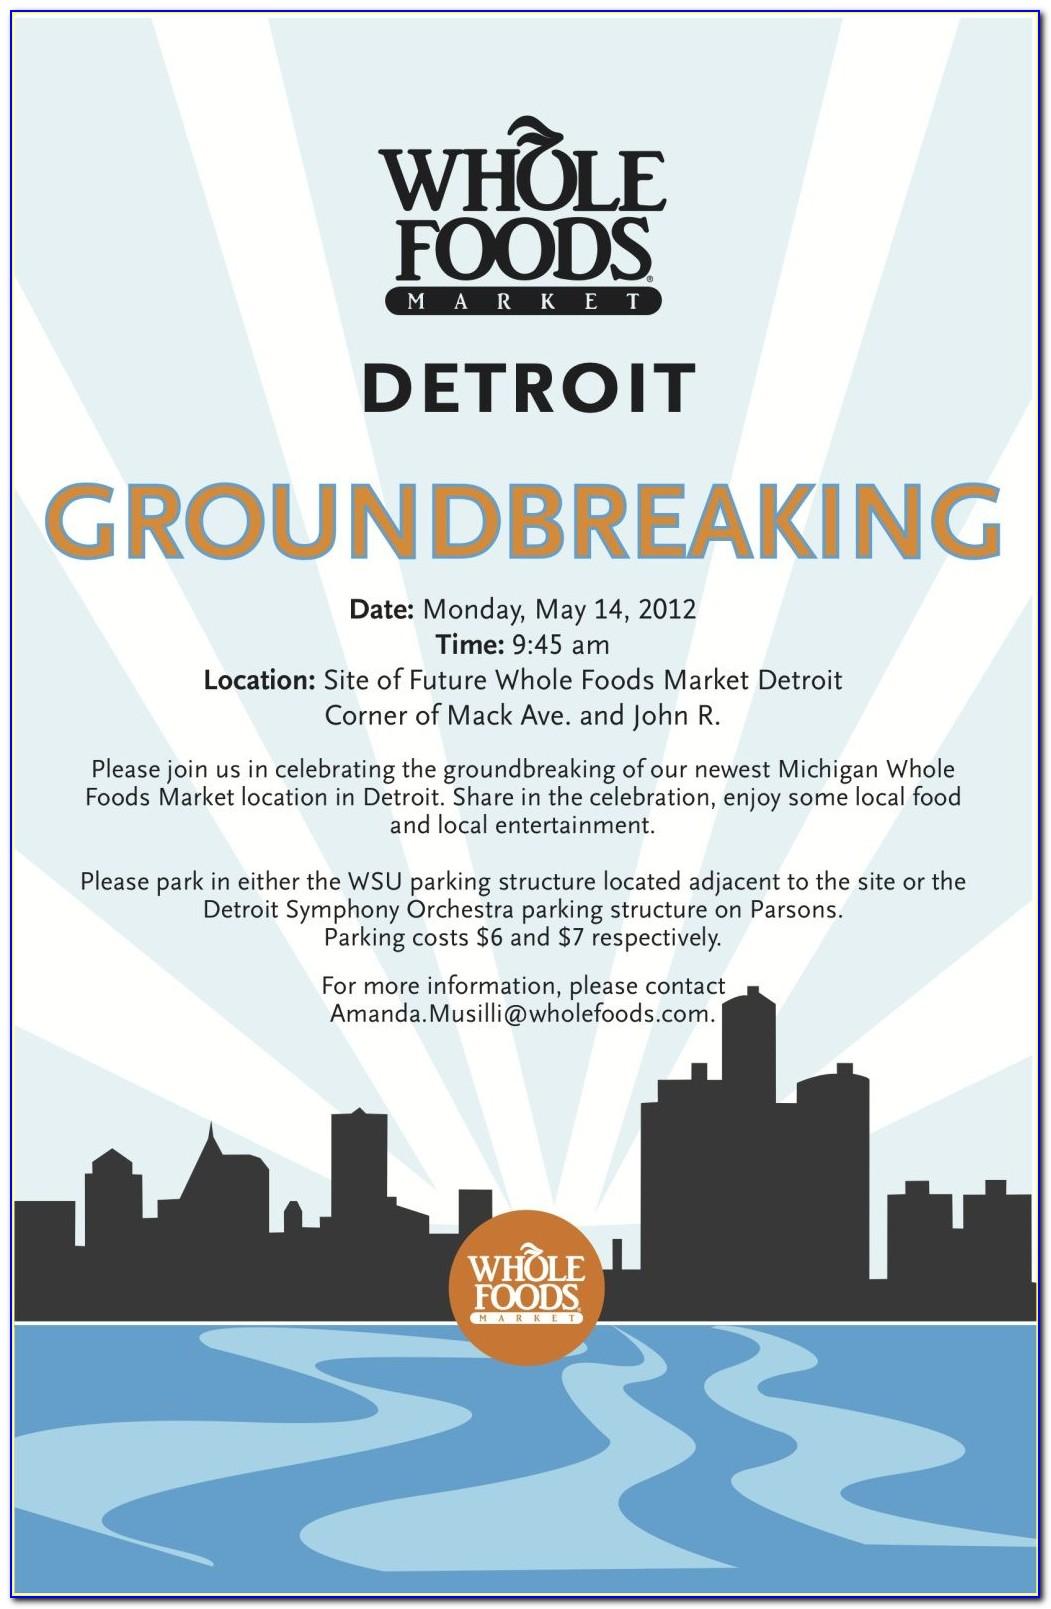 Groundbreaking Ceremony Invitation Sample